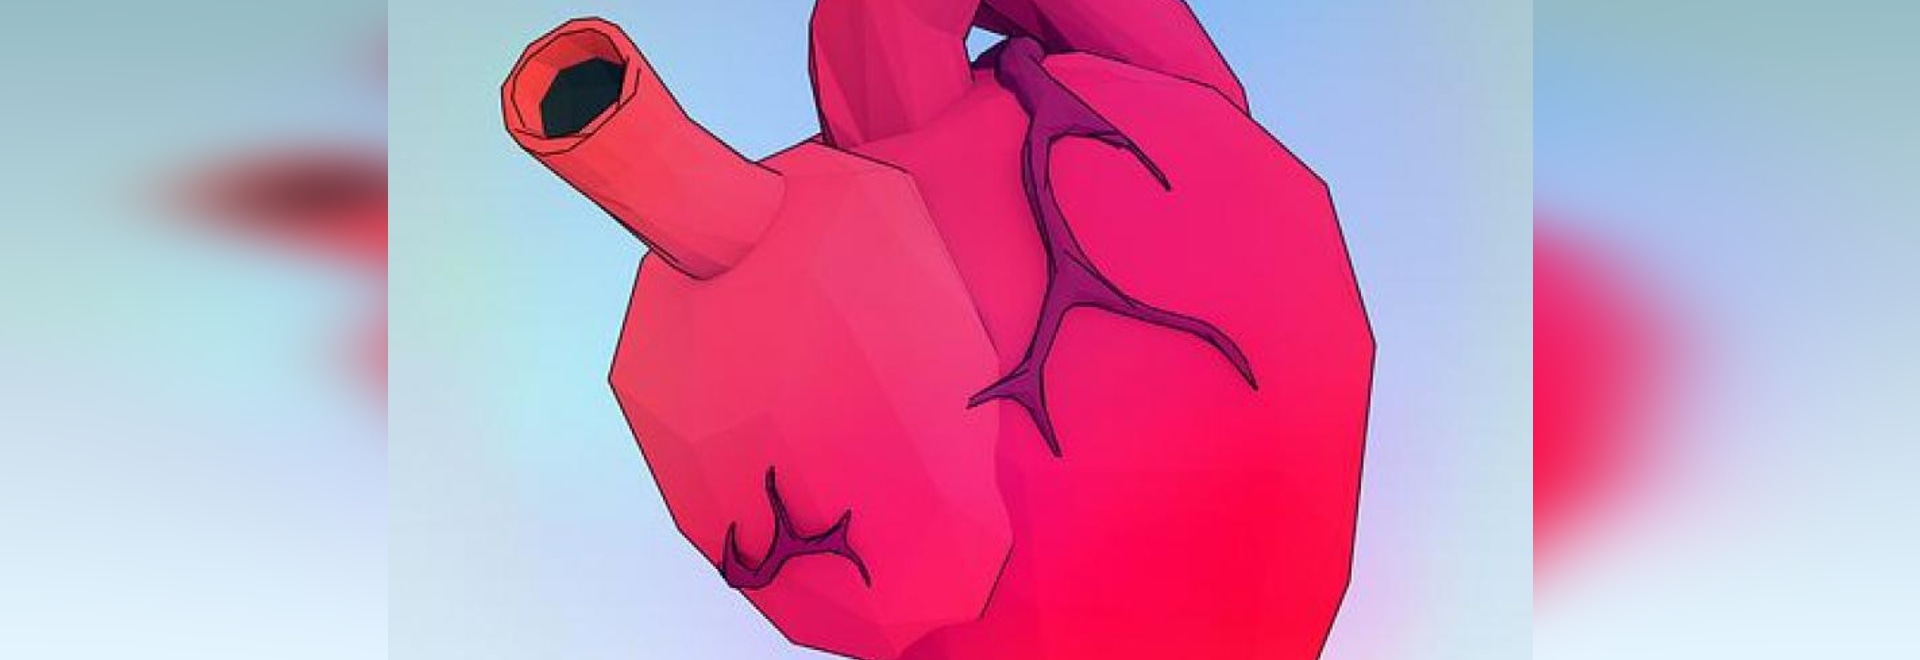 Un nuovo modo modellare la valvola cardiaca